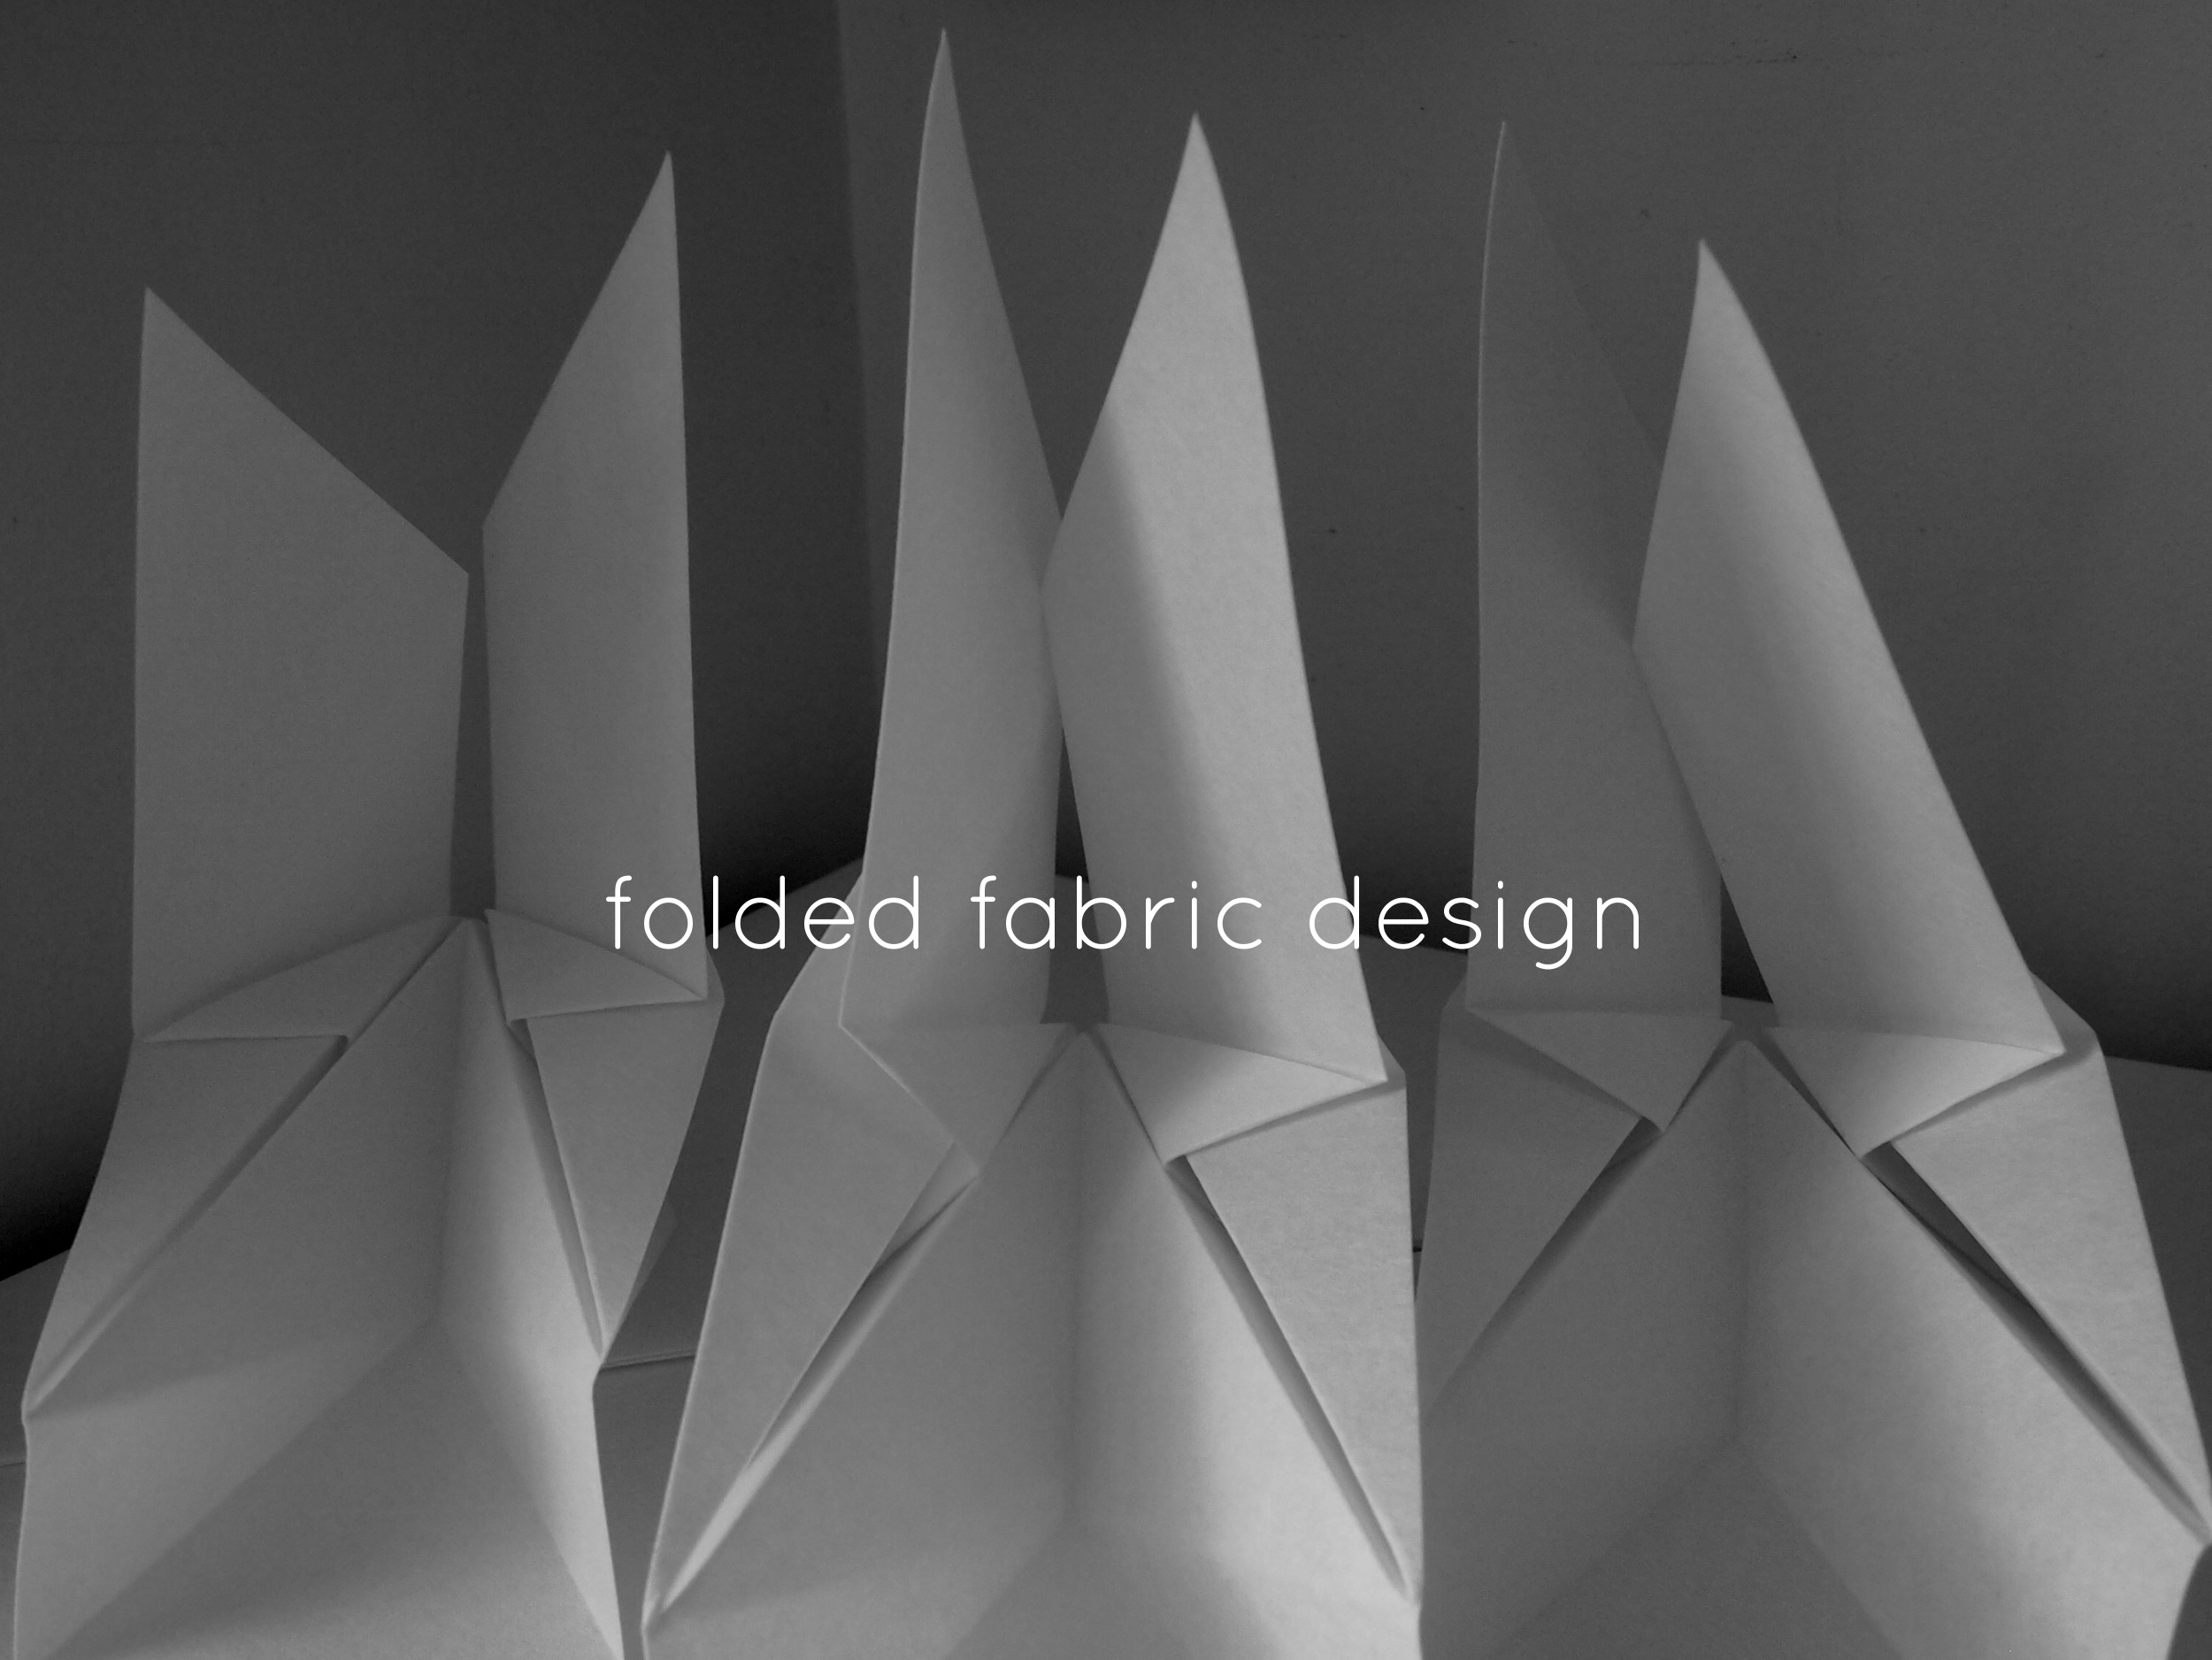 textile origami folded fabric design